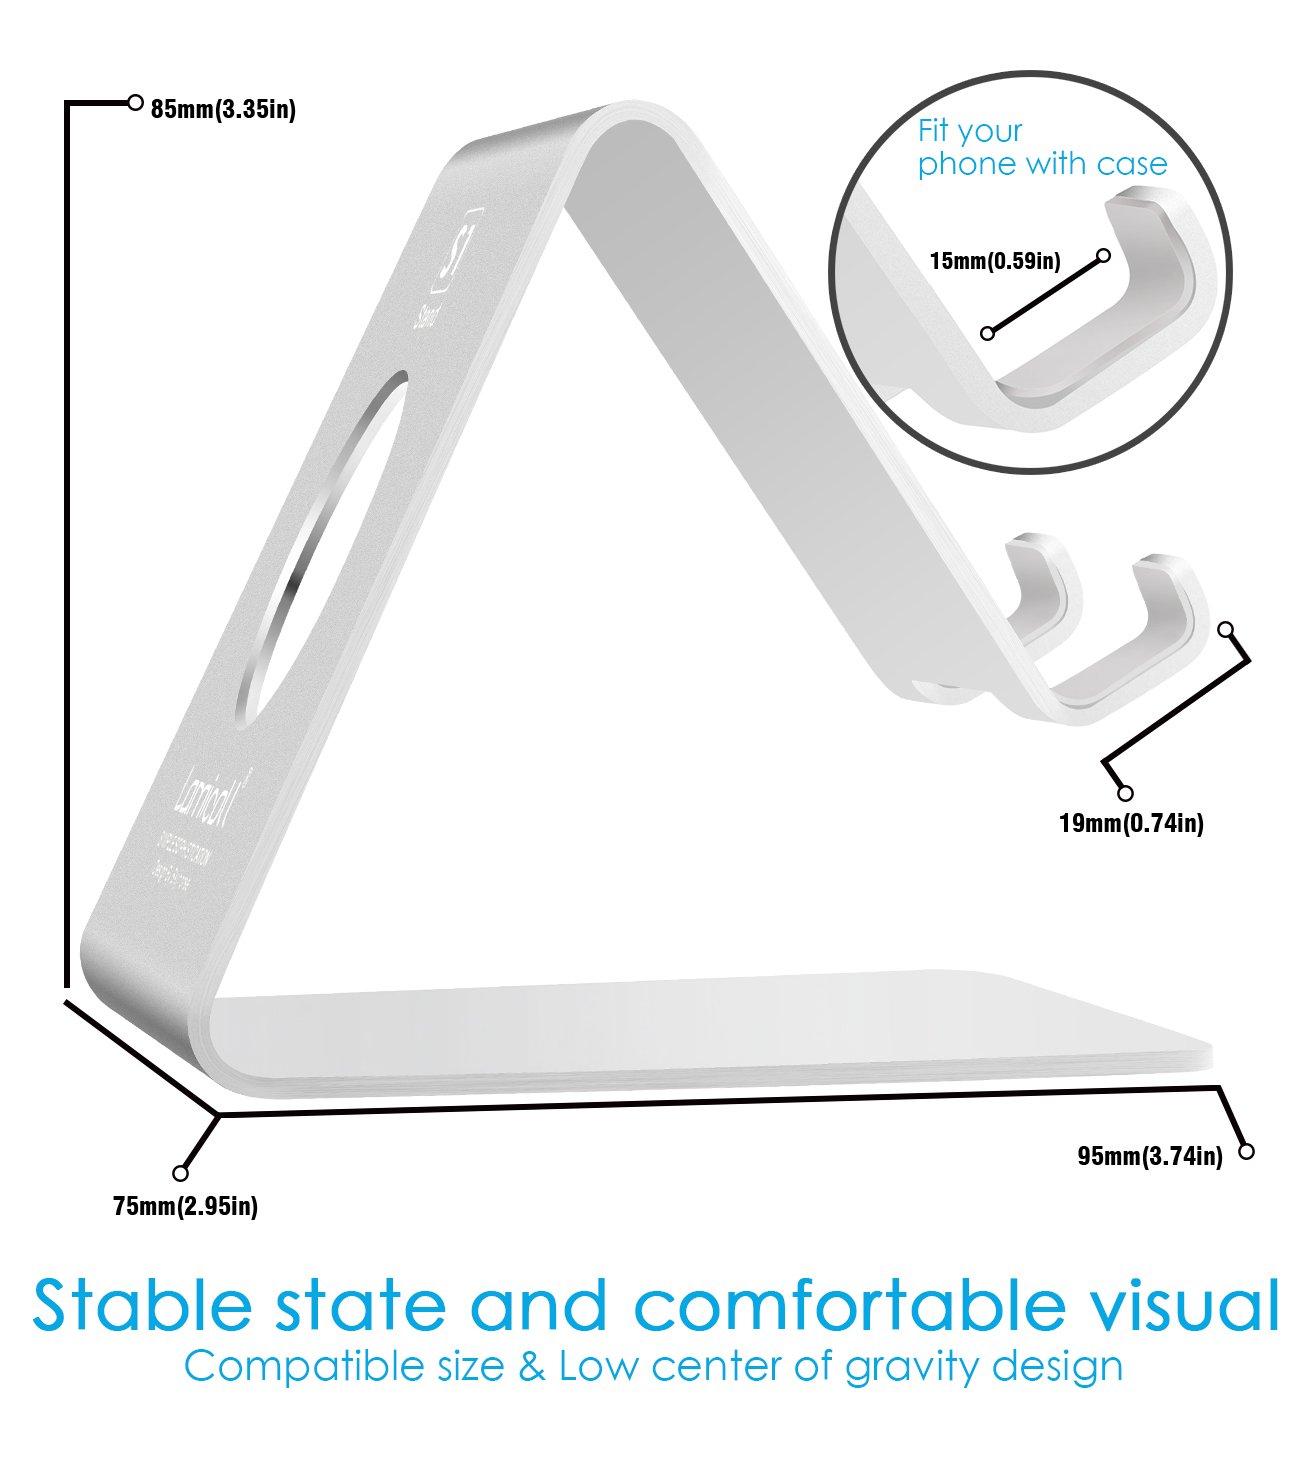 handy halterung lamicall iphone dock phone st nder iphone. Black Bedroom Furniture Sets. Home Design Ideas